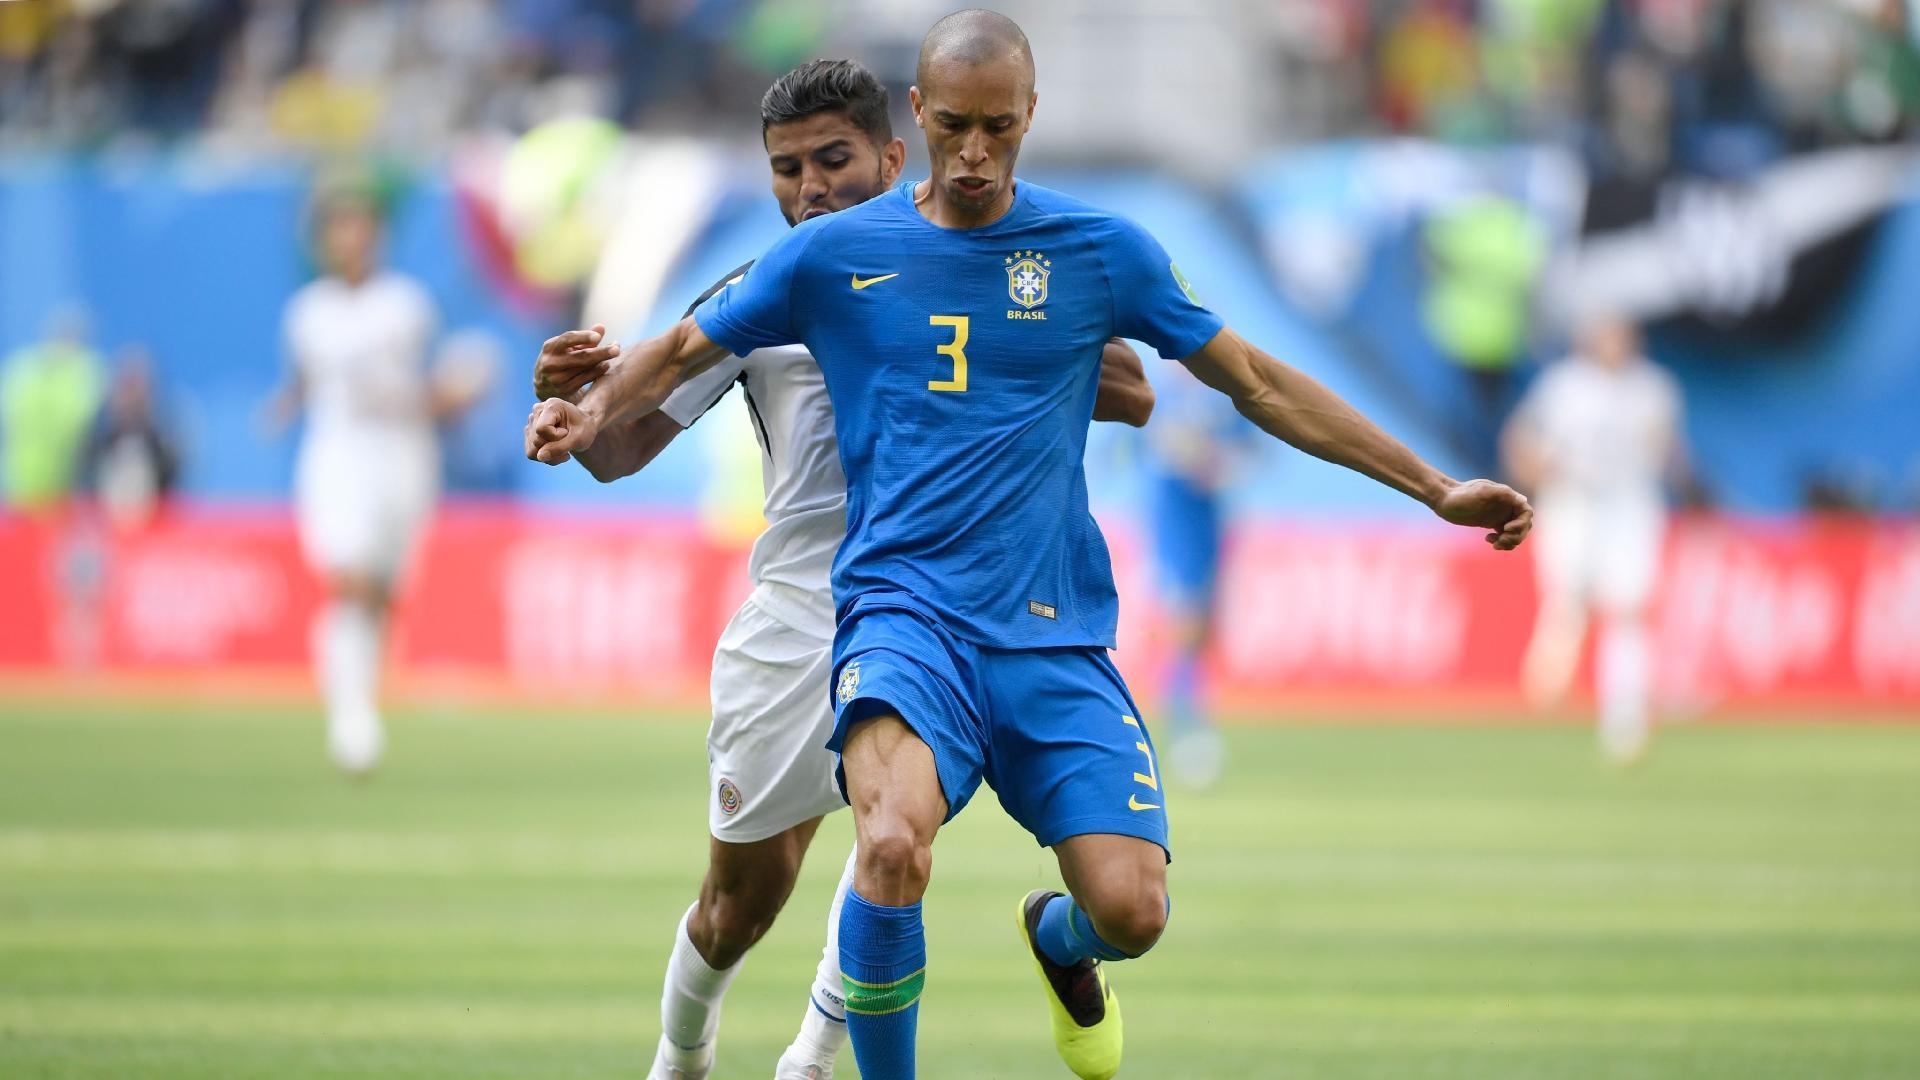 Miranda protege a bola enquanto é marcado por Johan Venegas, durante a partida entre Brasil e Costa Rica